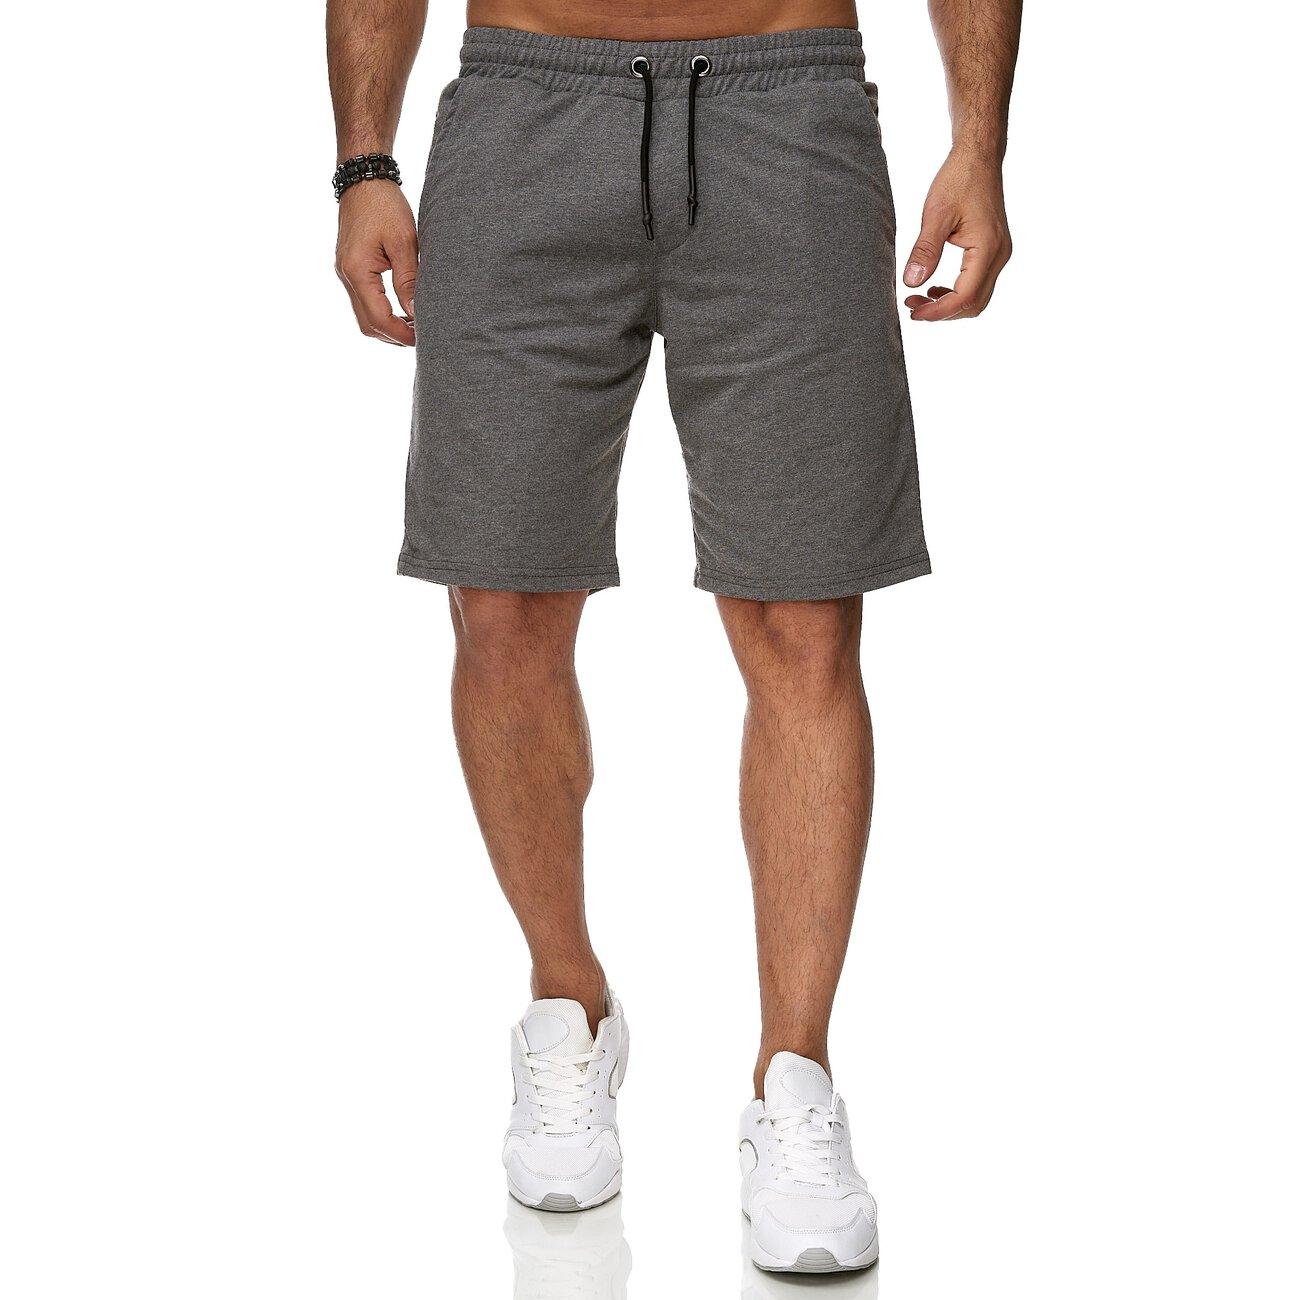 reslad sweat shorts herren basic sport freizeit kurze sweat hose. Black Bedroom Furniture Sets. Home Design Ideas